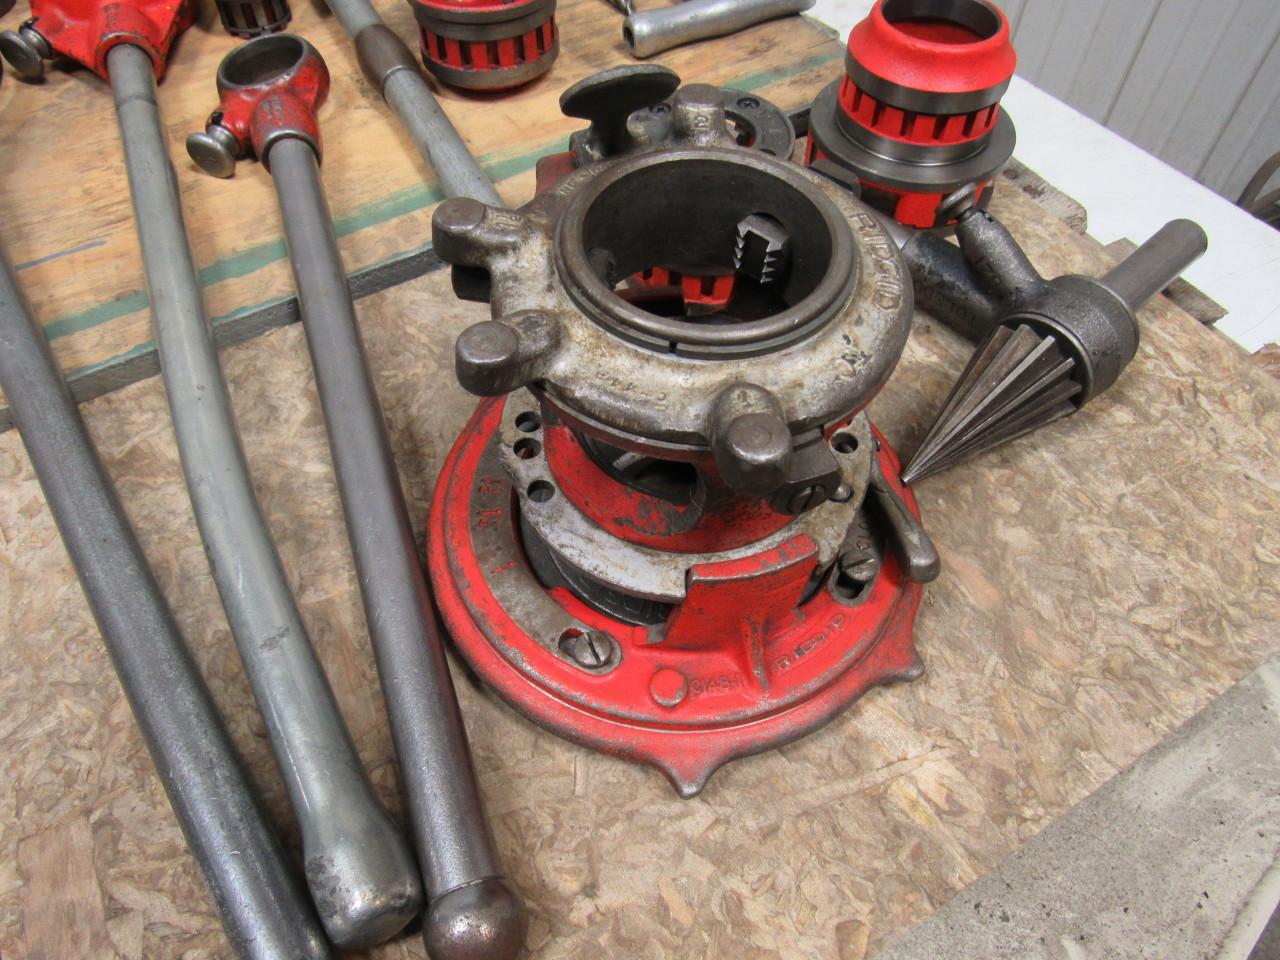 Ridgid 65r Receding Pipe Threader W 8 Dies 3 Handles